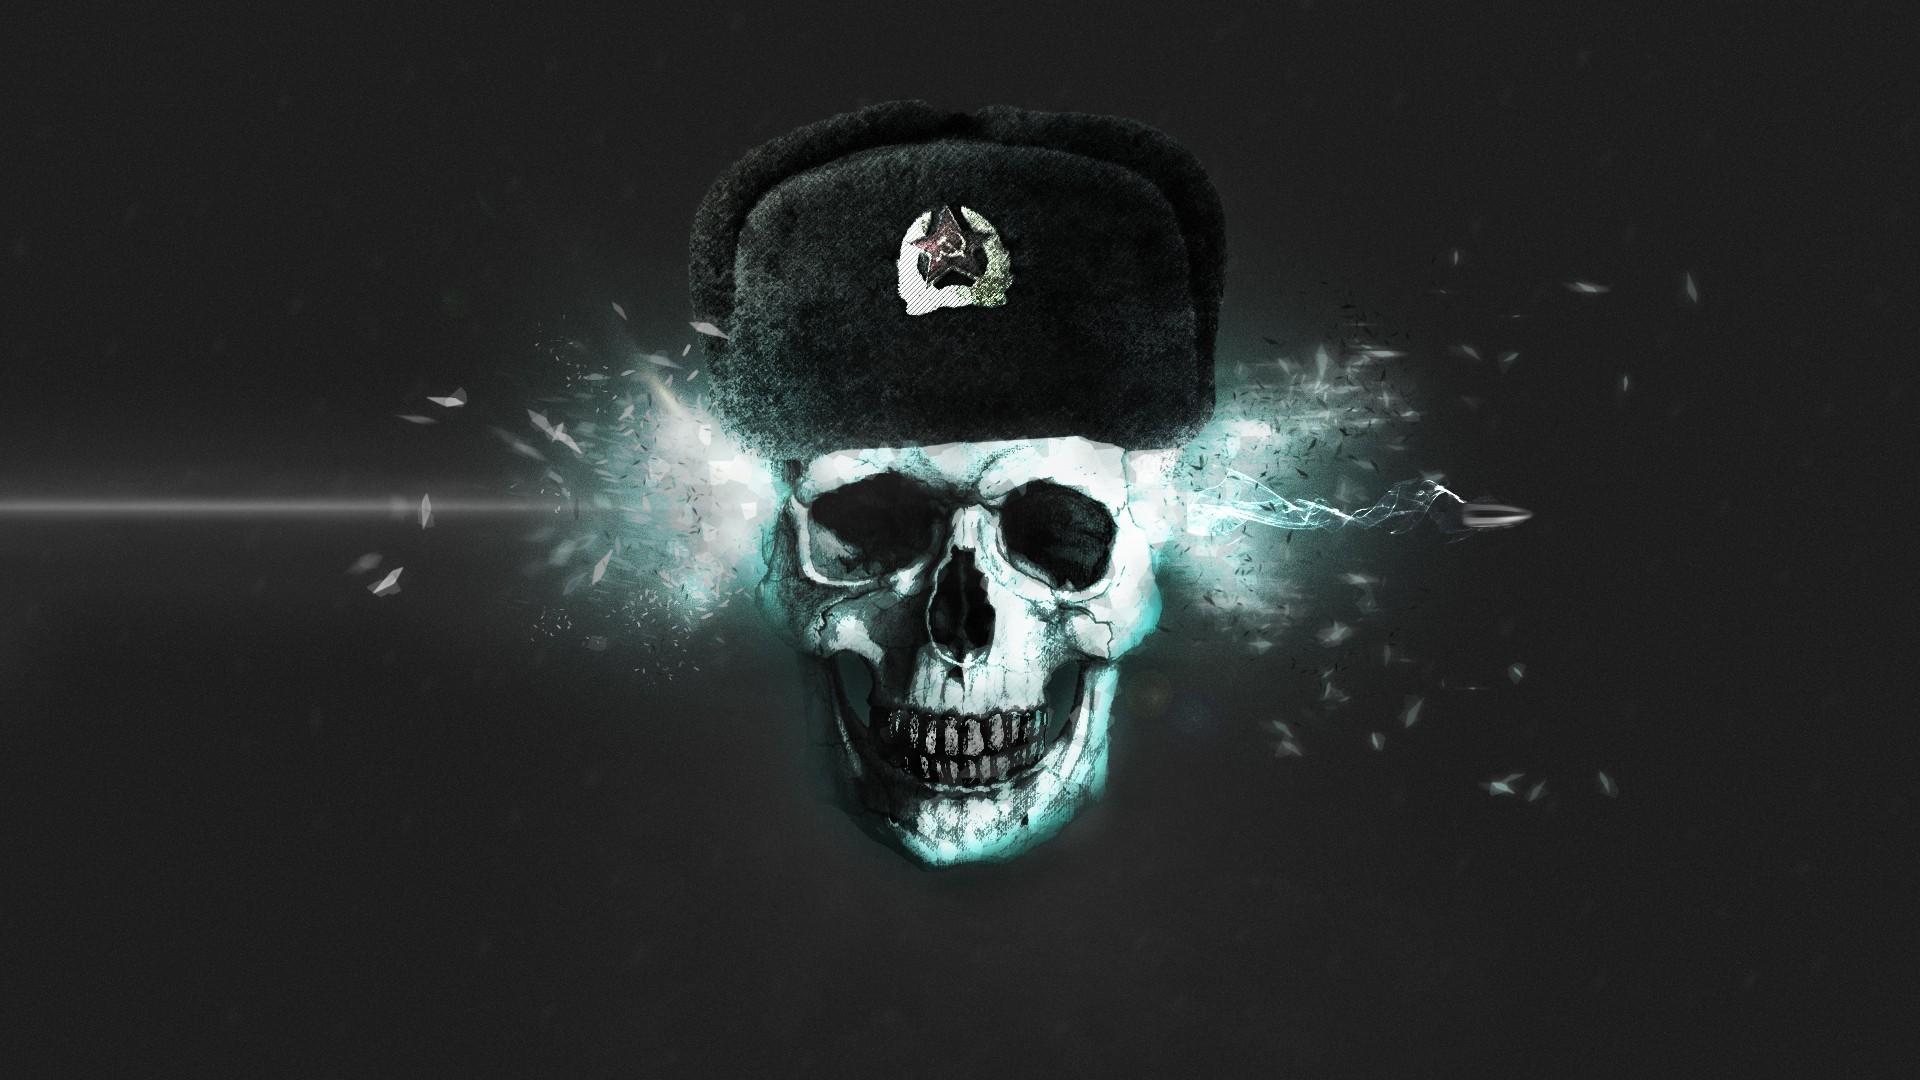 Skeleton Black Background Fire Skull Cap Bullet Anarchy Desktop Wallpapers 600x1024